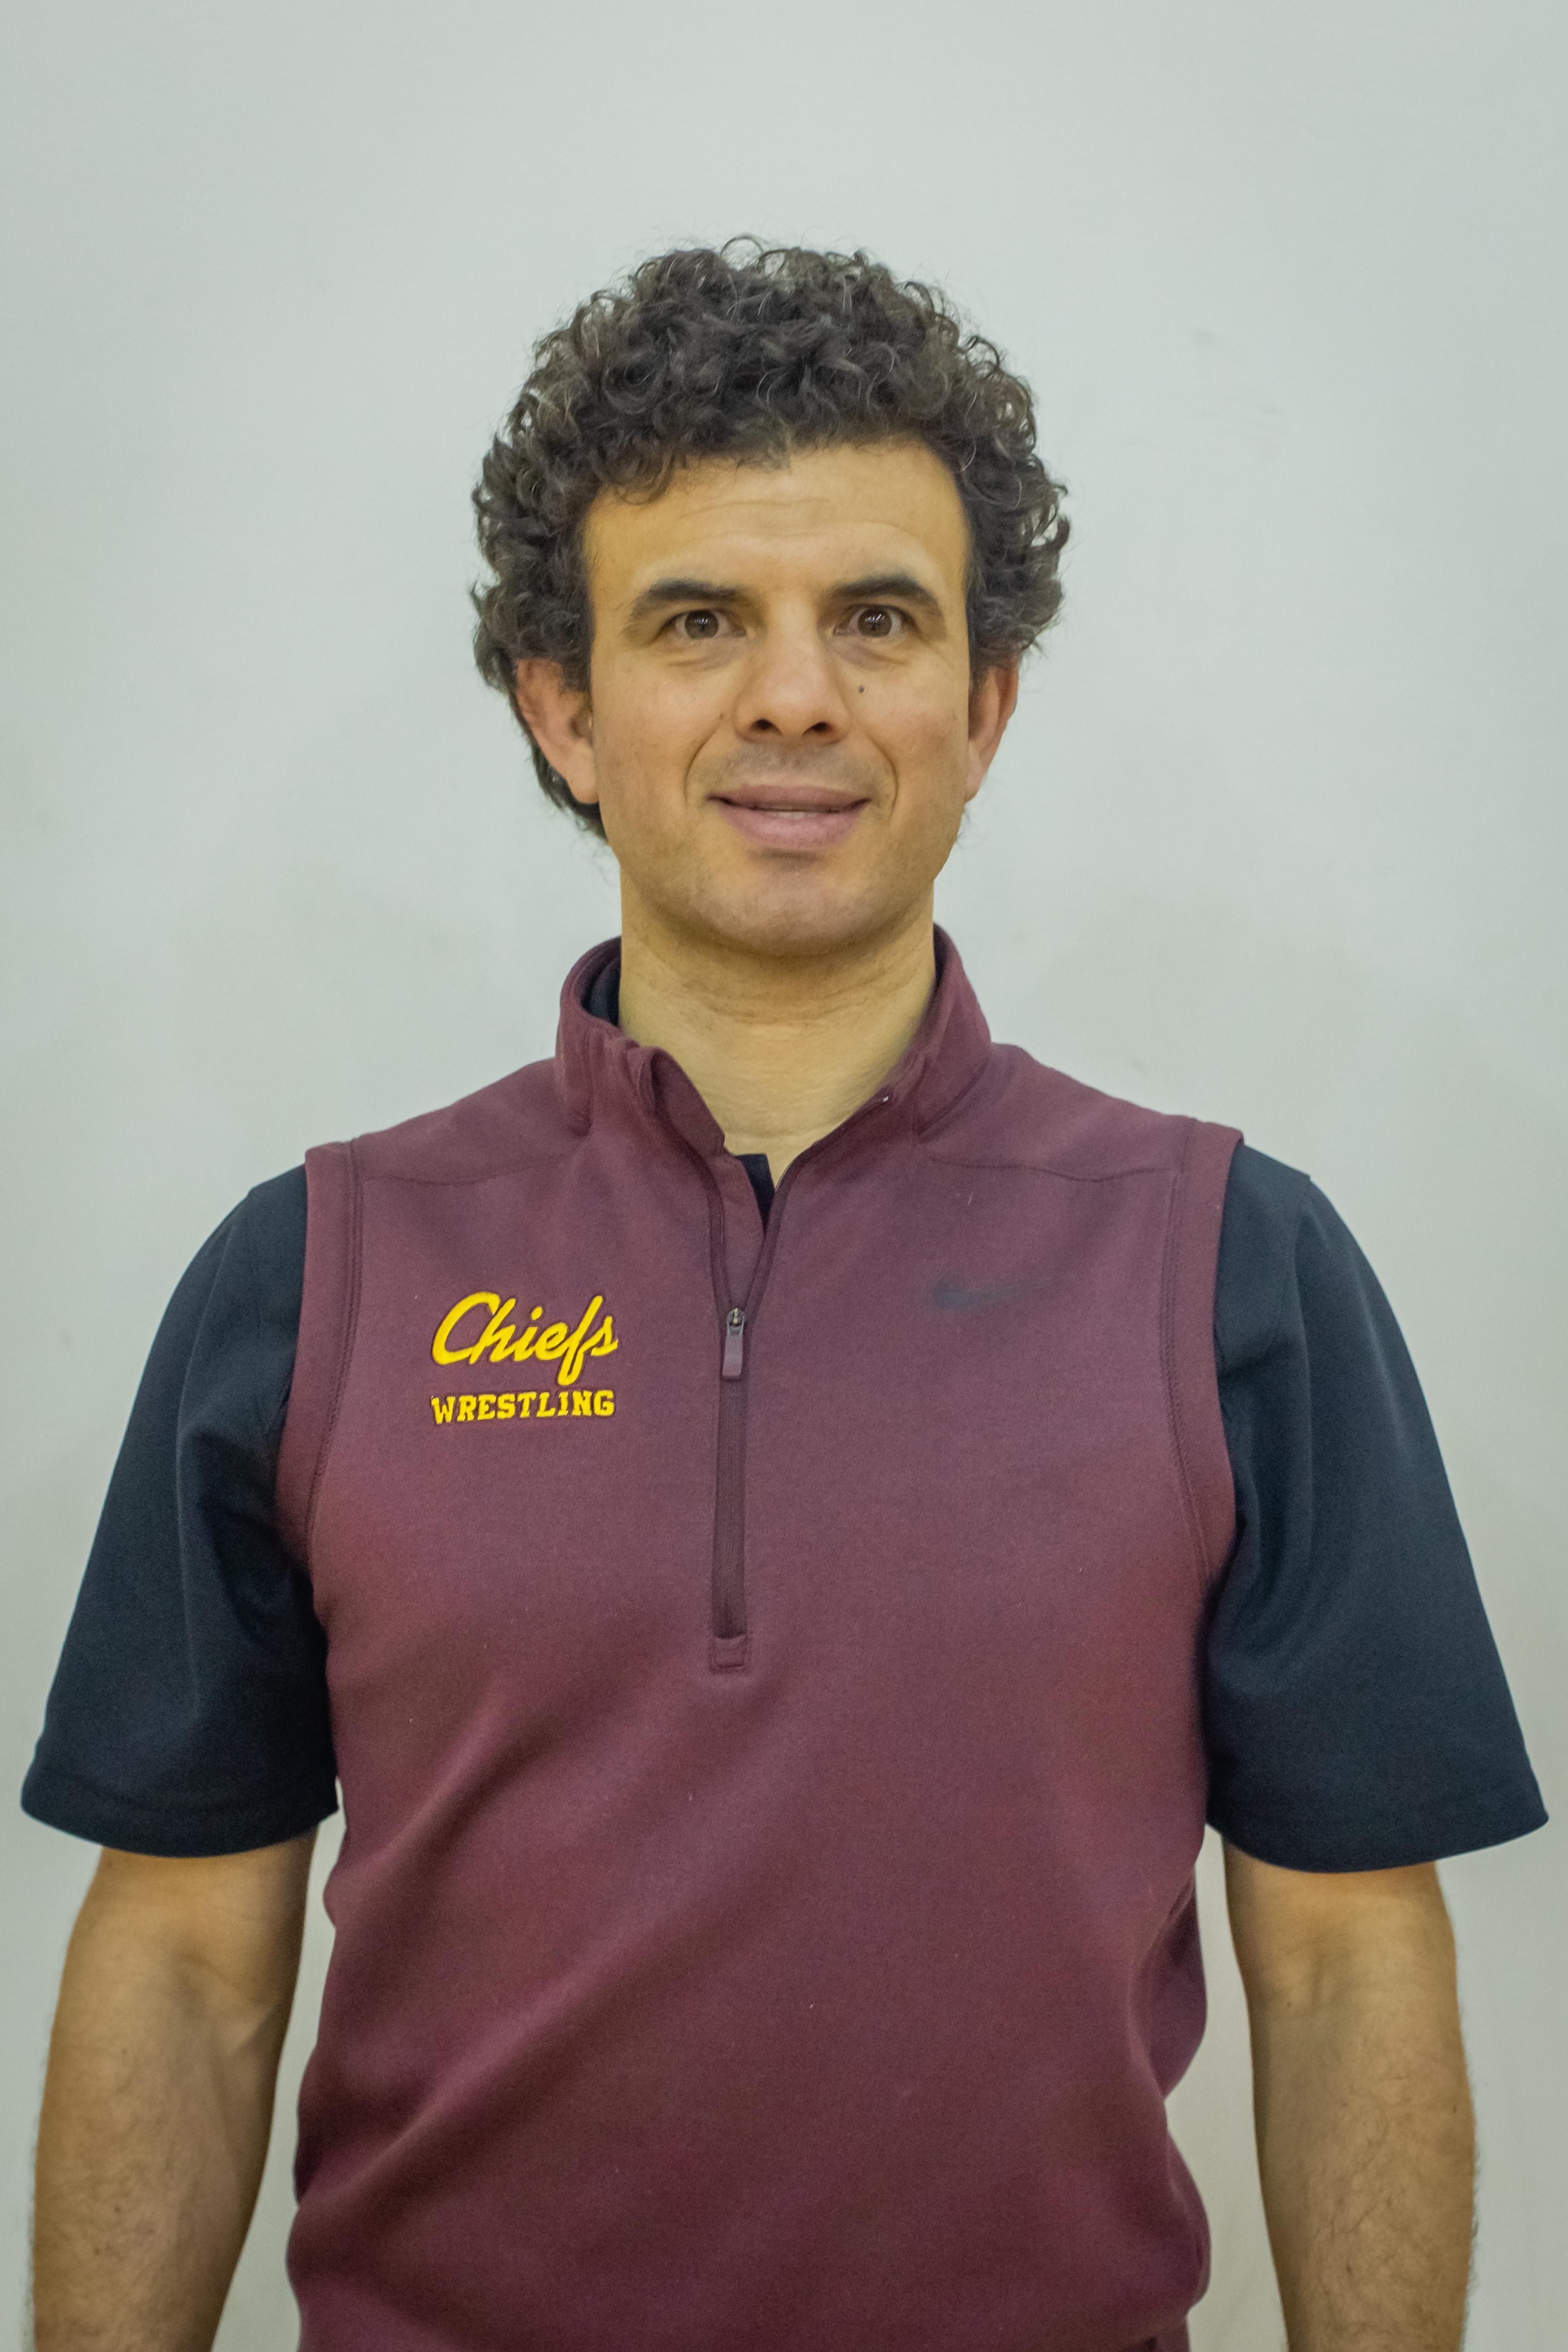 Jaime Garza